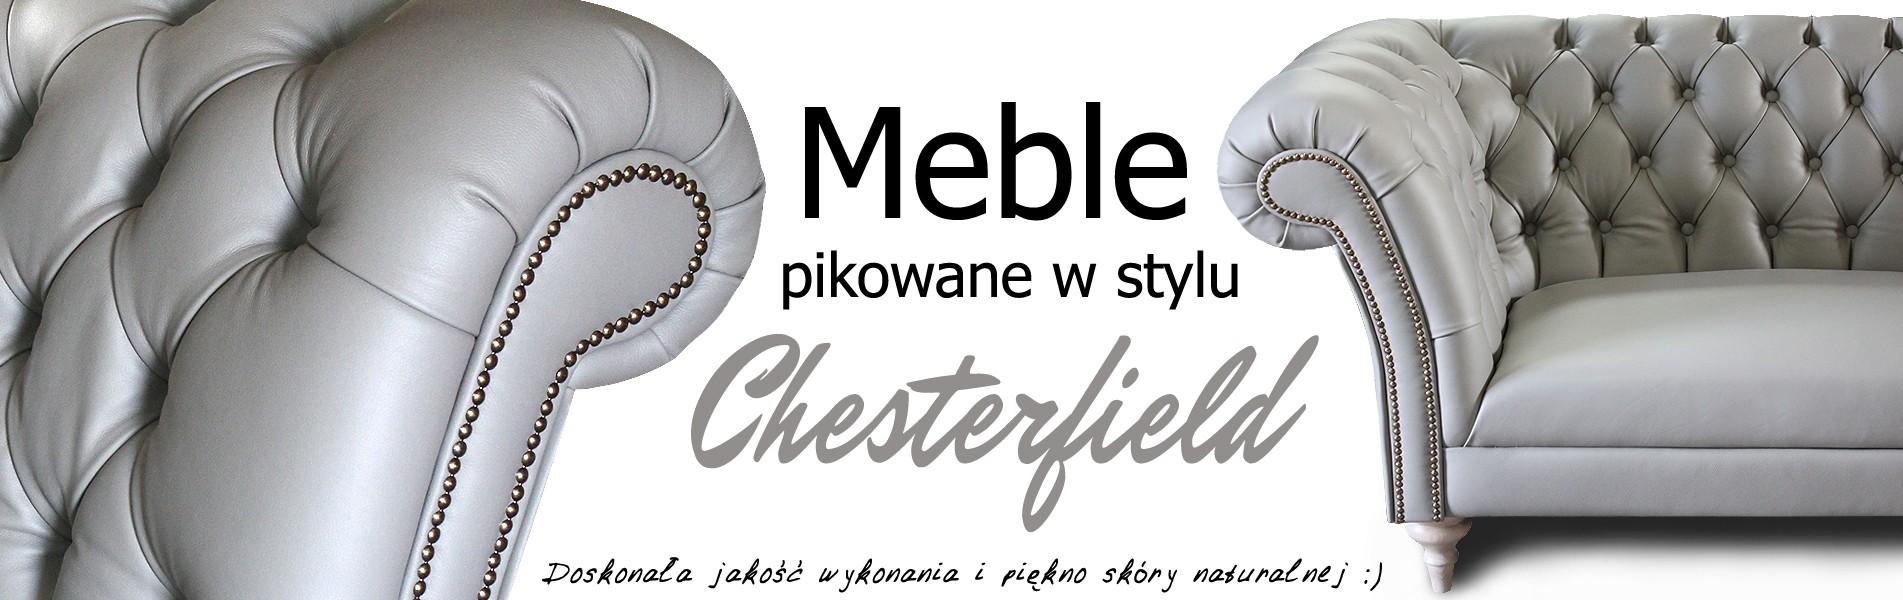 Meble chesterfield pikowane